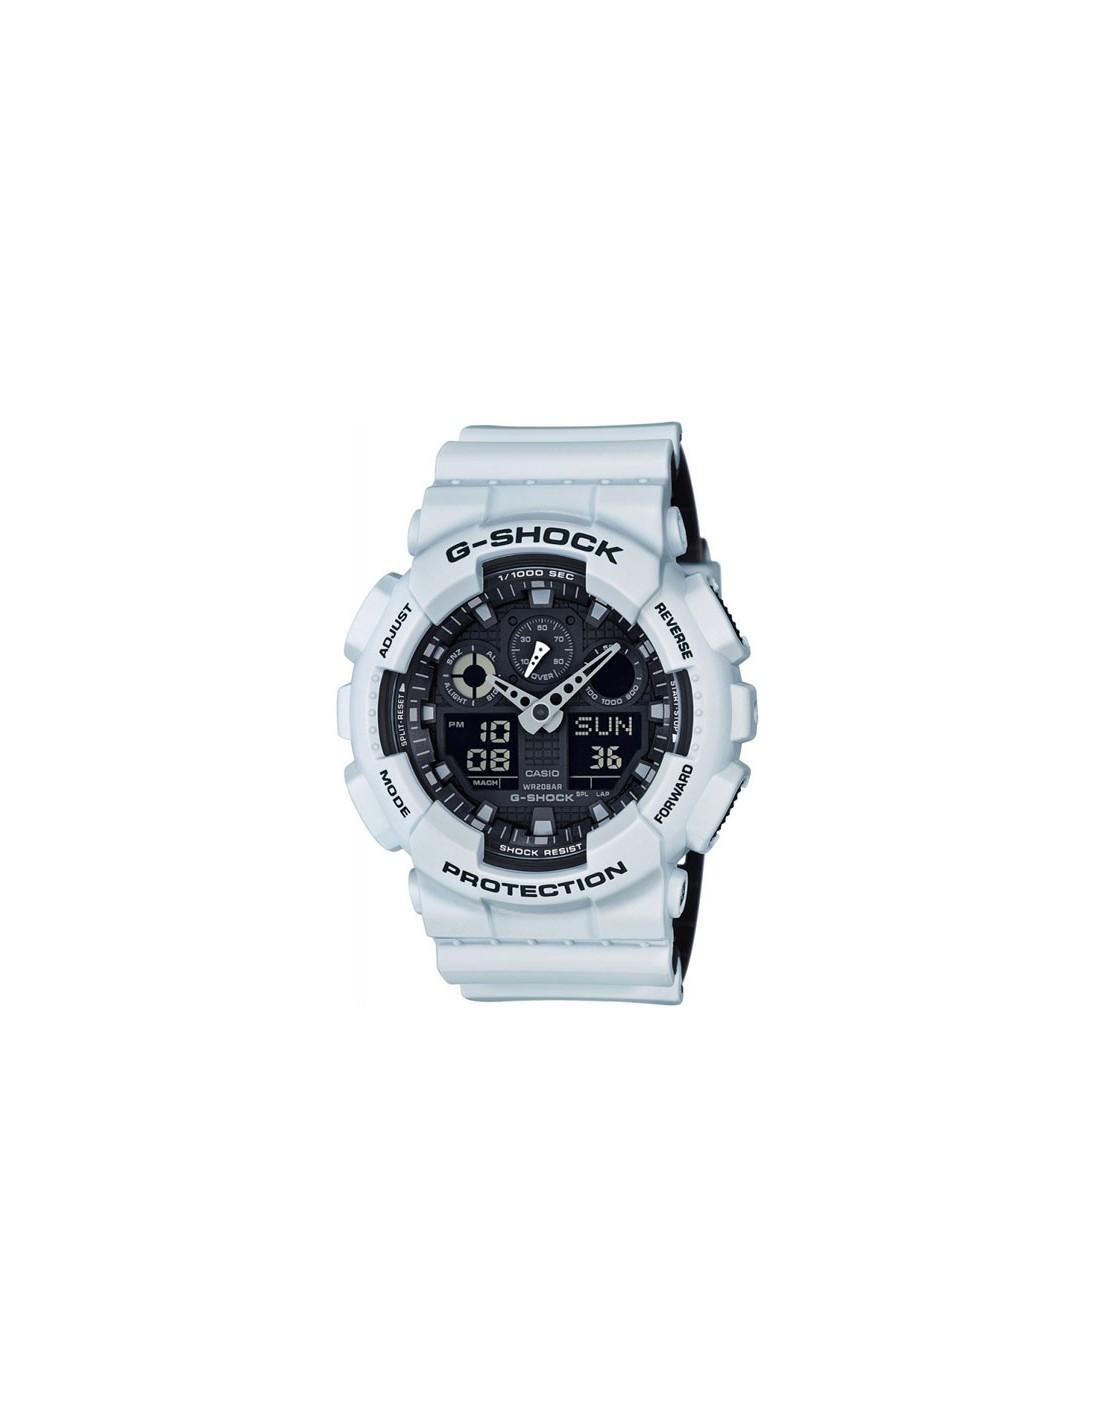 9b27a1b9f9fb Reloj Casio G-Shock GA-100L-7AER